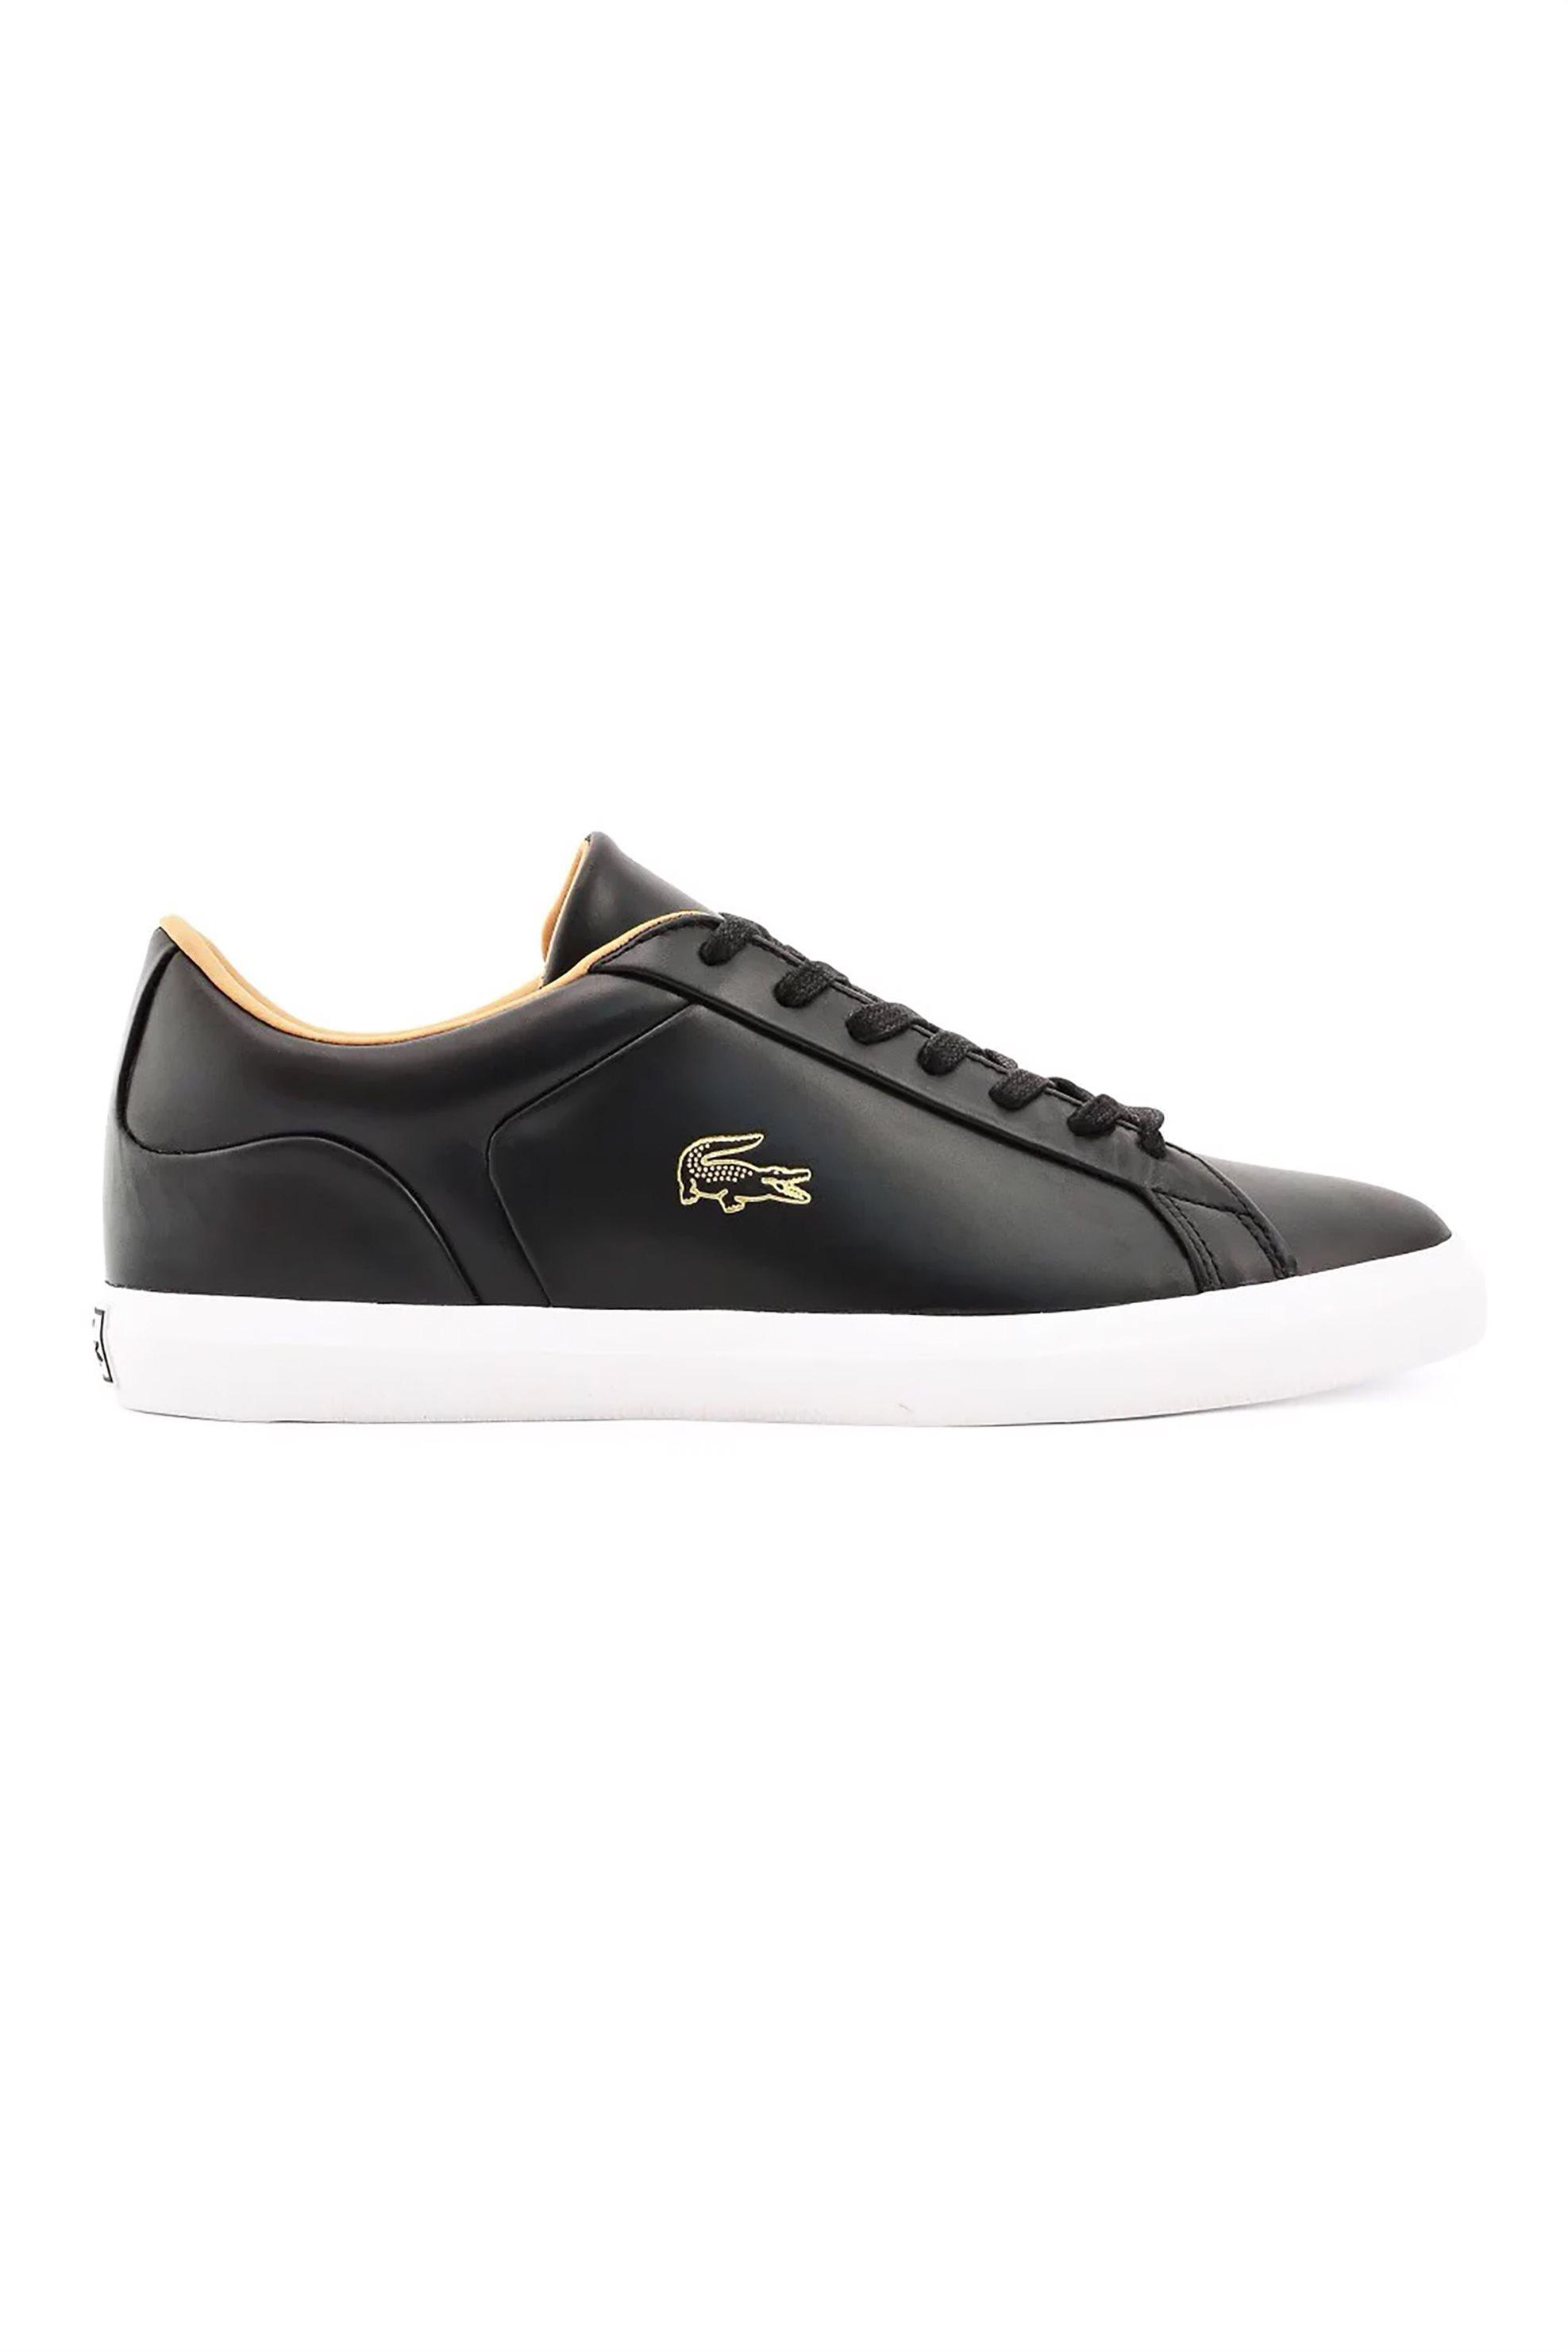 "Lacoste ανδρικα sneakers με χρυσό λογοτυπο ""Lerond"" – 40CMA0012312 – Μαύρο"